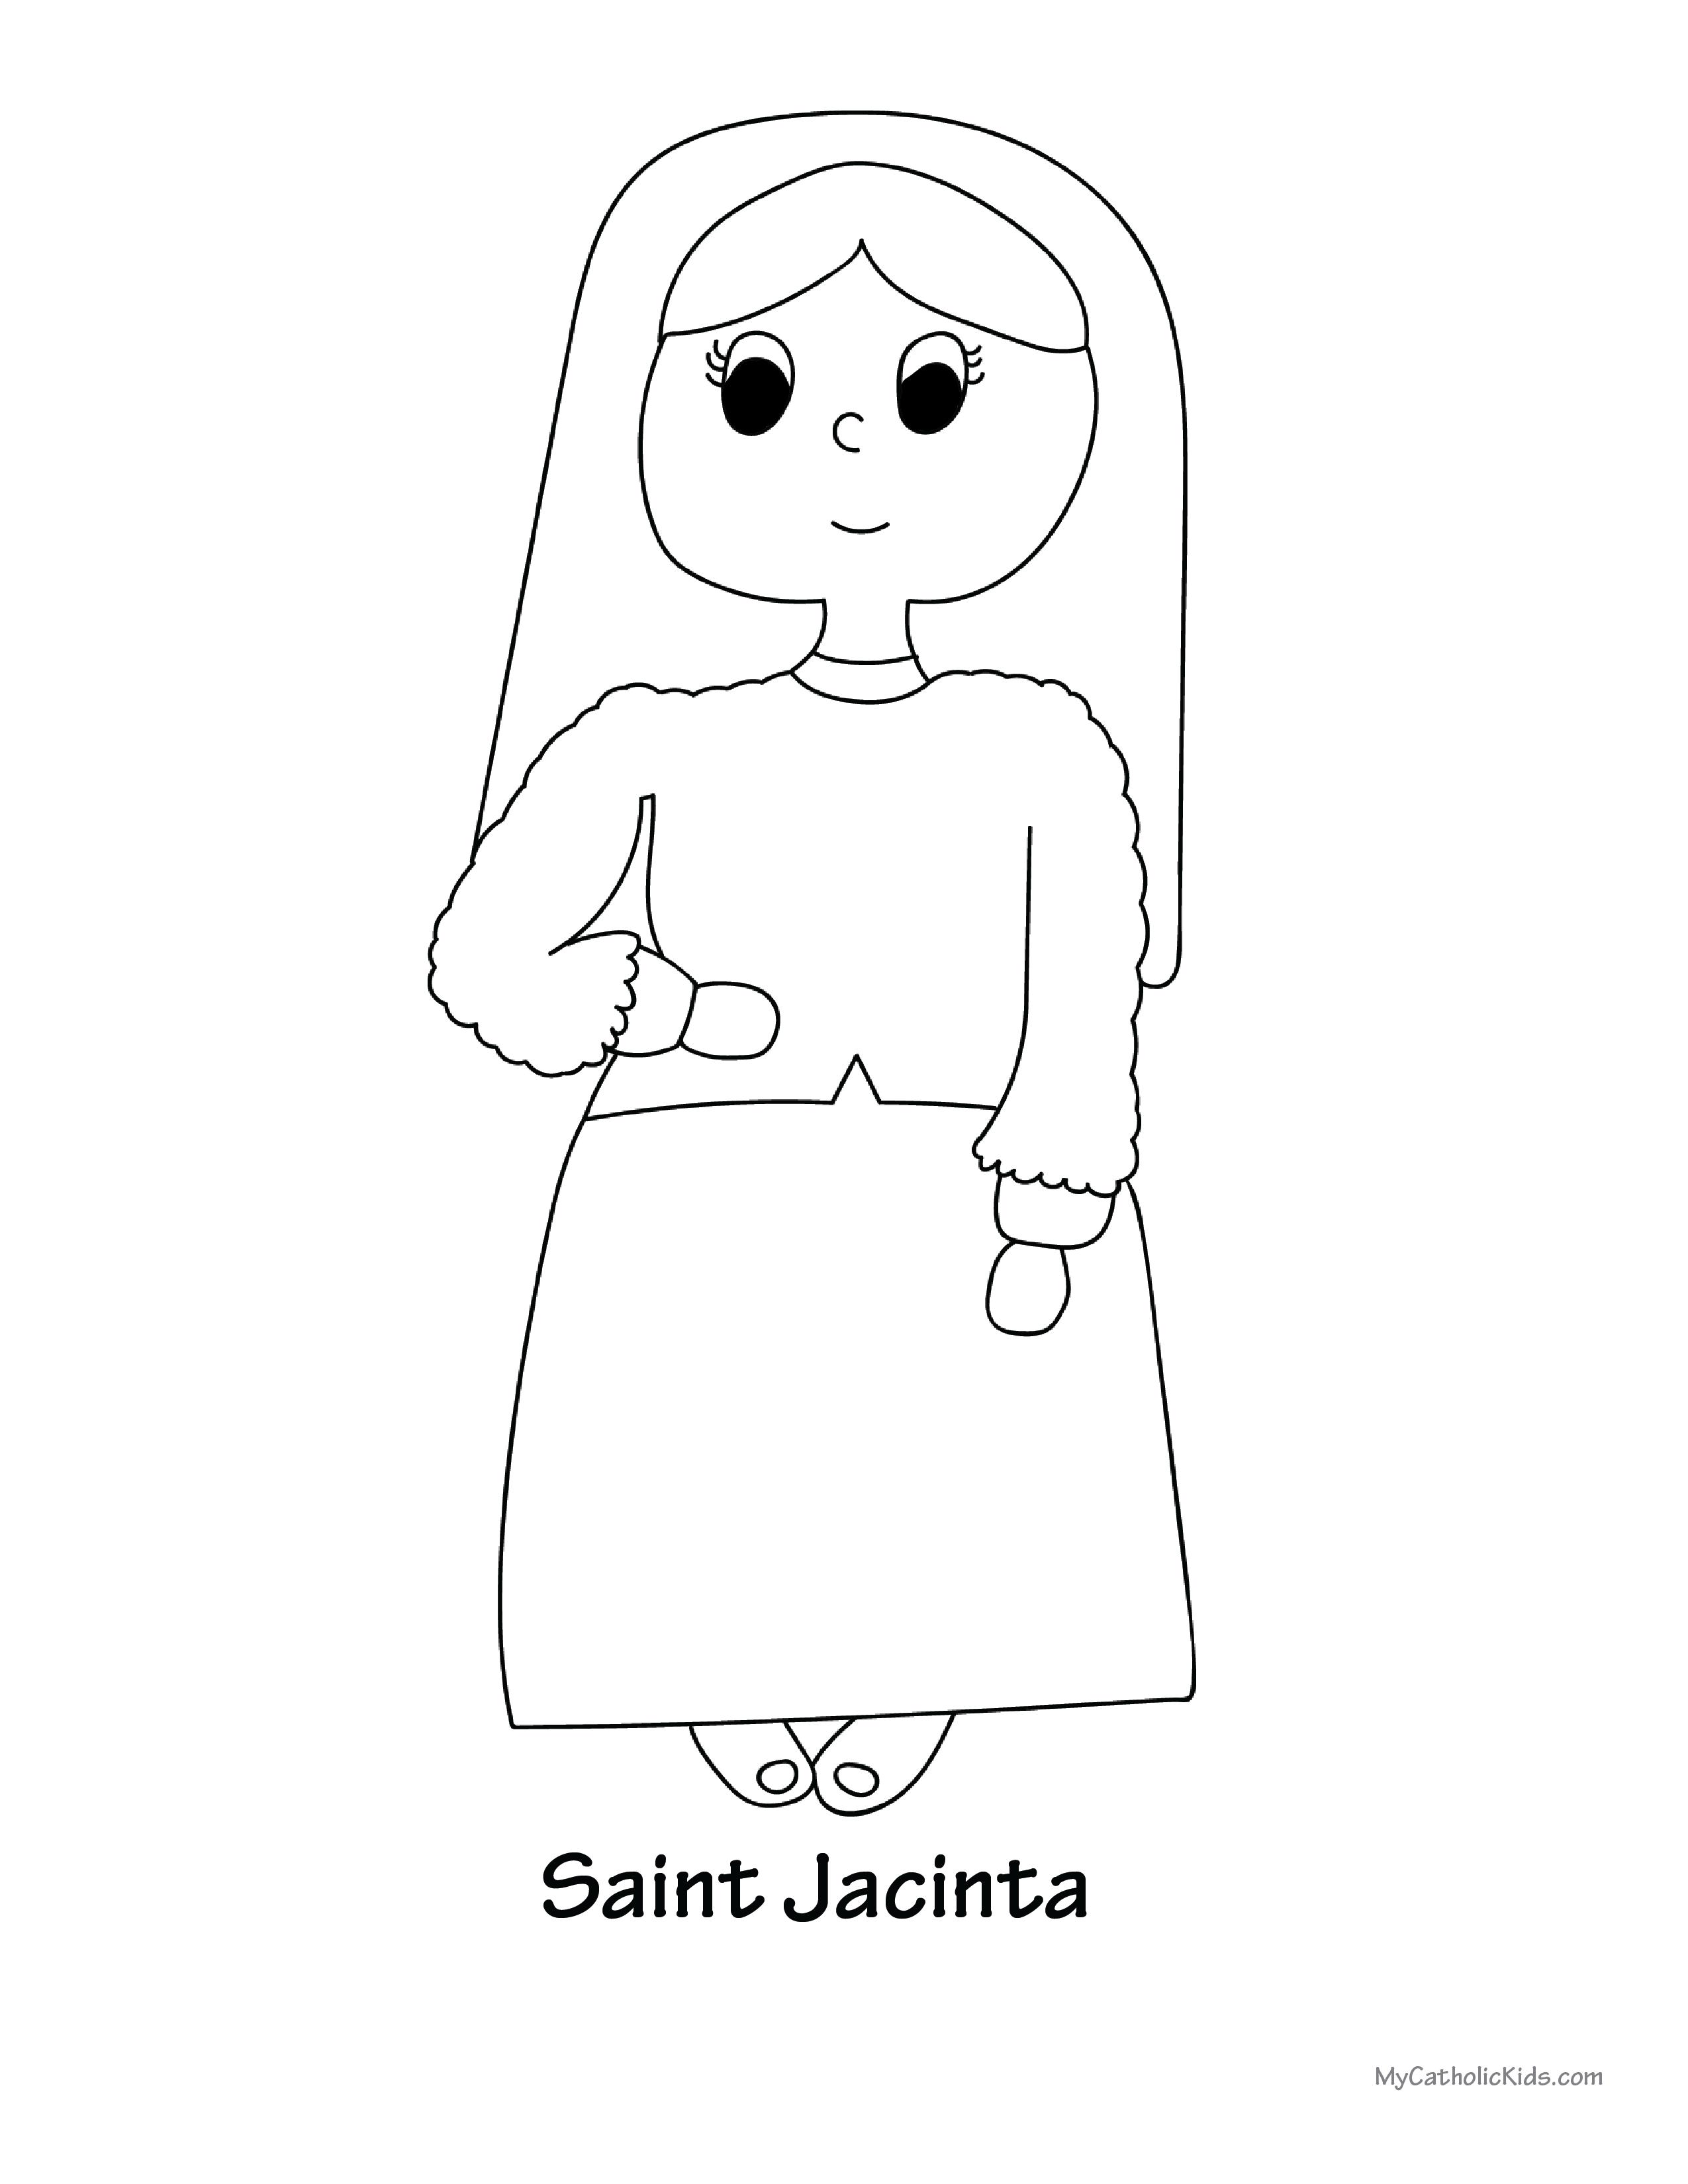 Saint Jacinta coloring sheet